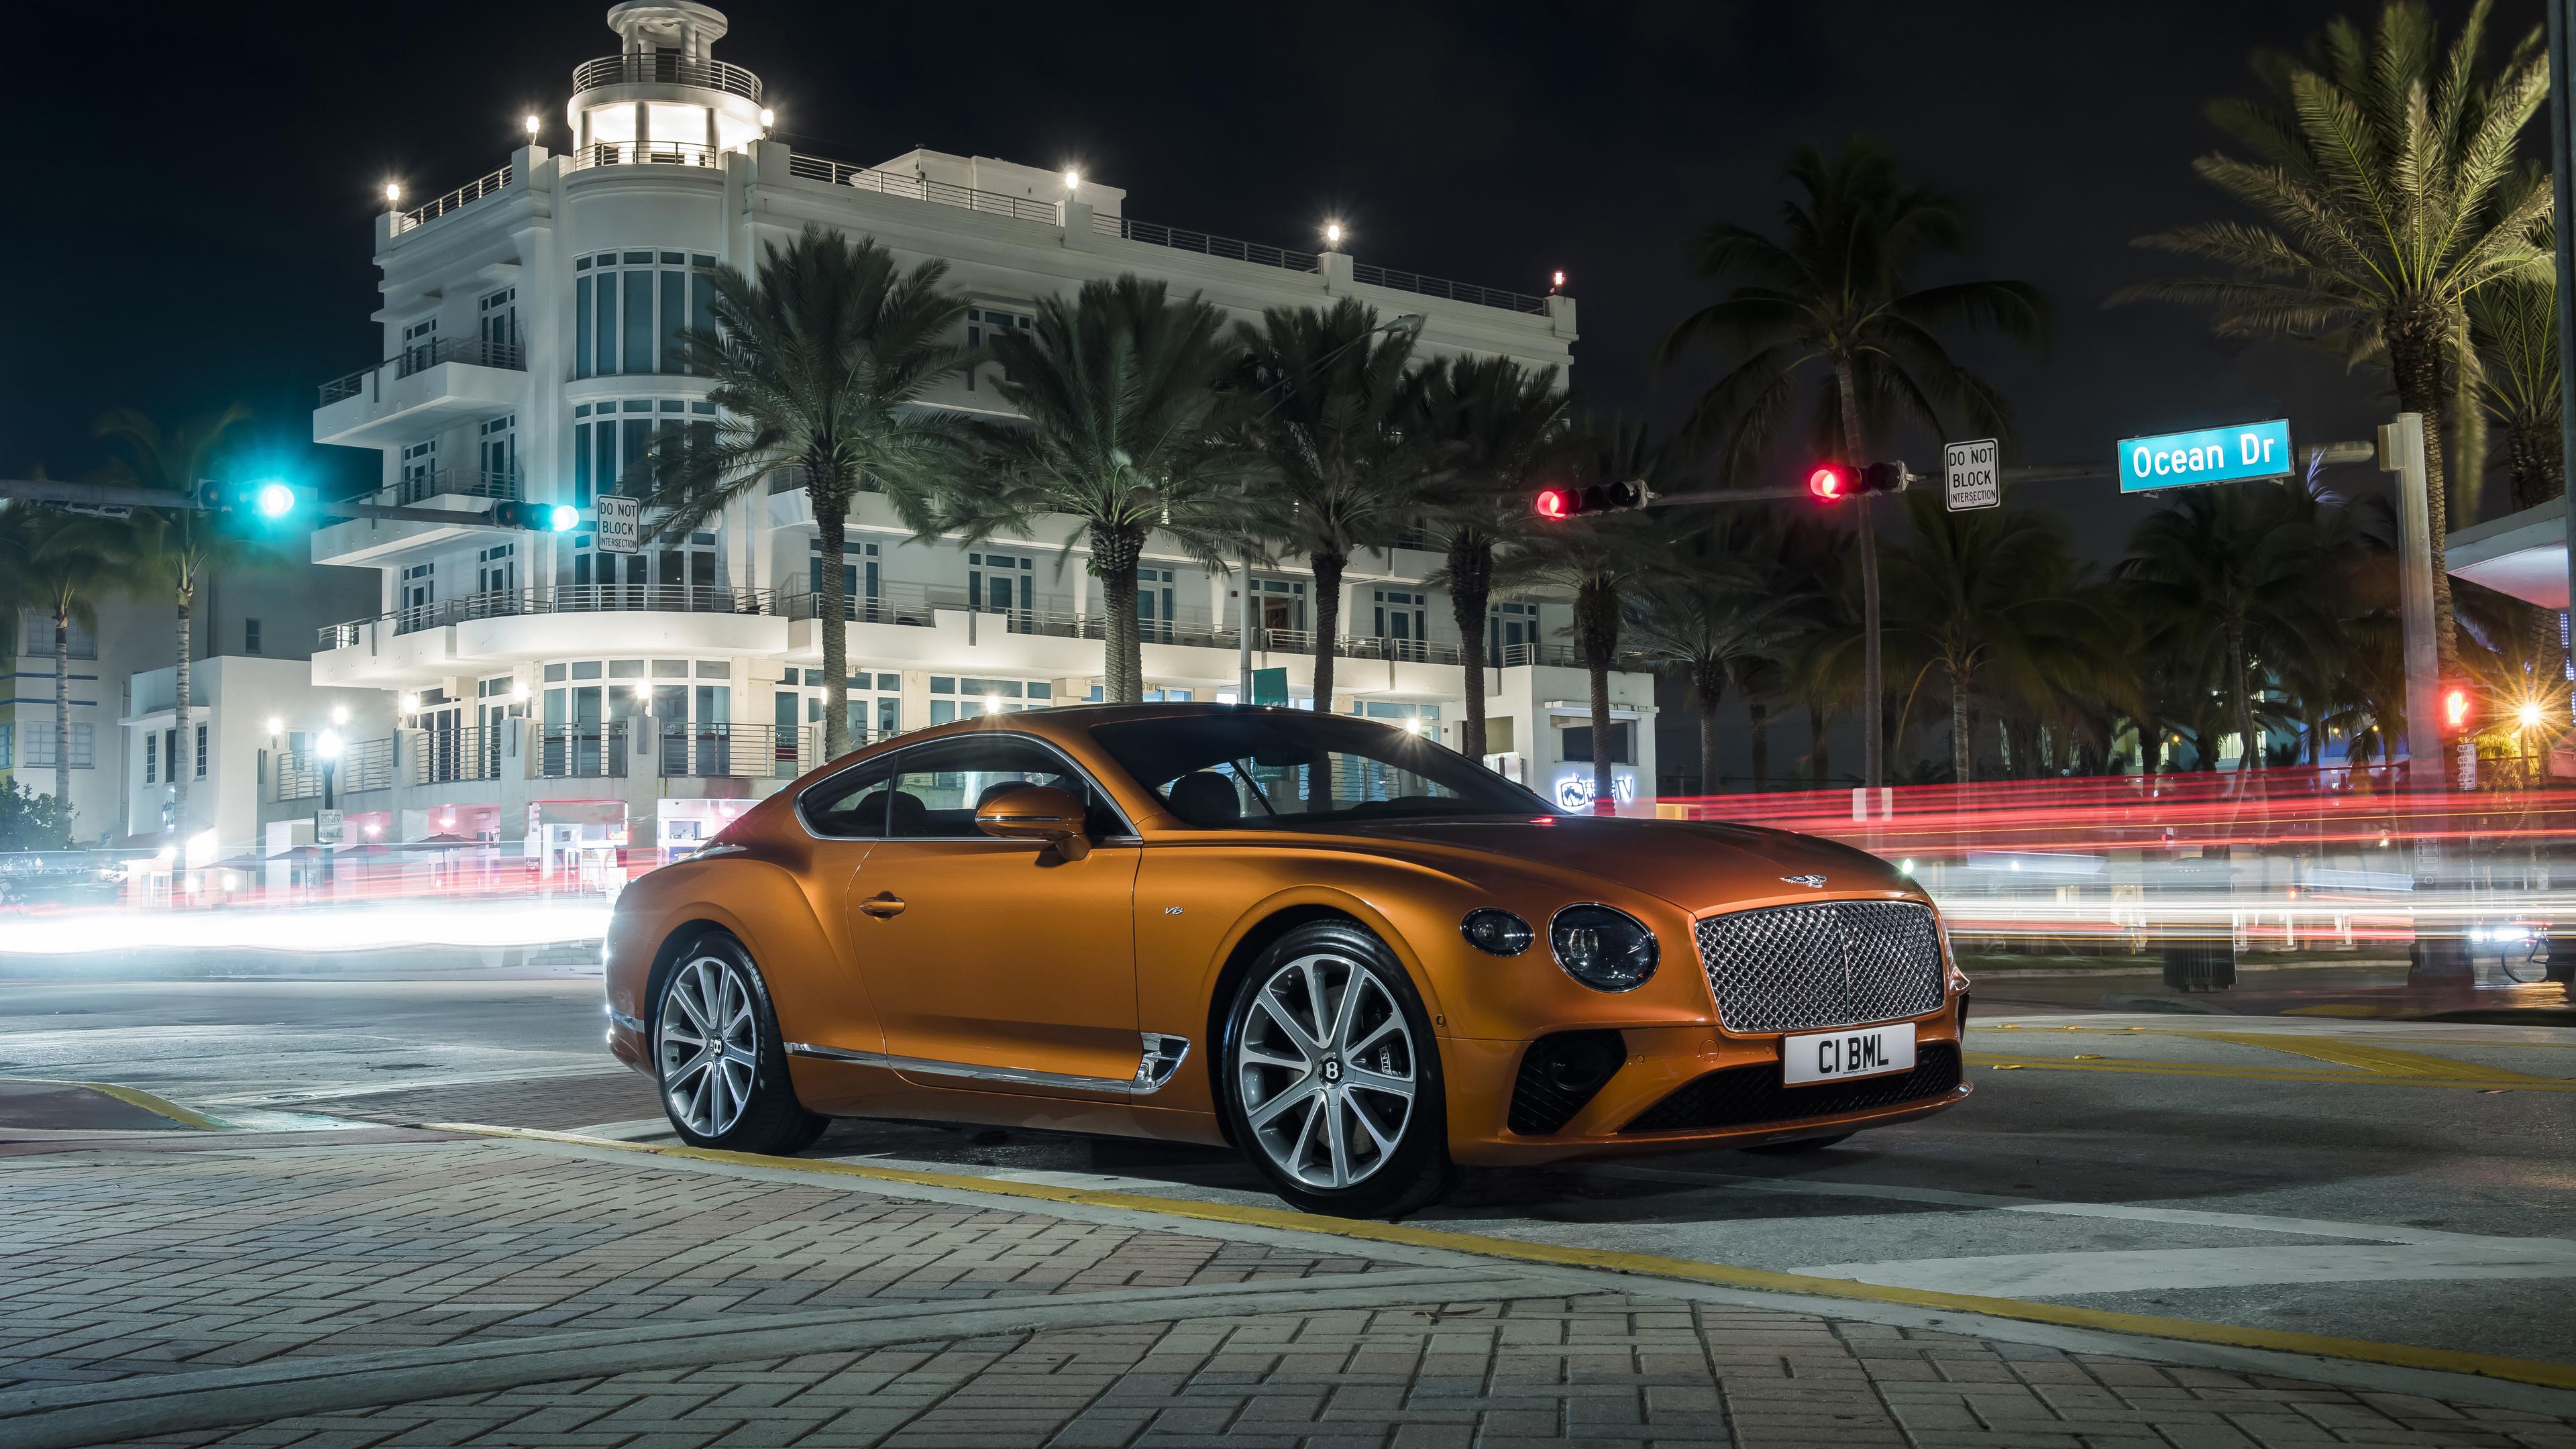 2019 bentley continental gt v8 4k 1554245134 - 2019 Bentley Continental GT V8 4k - hd-wallpapers, cars wallpapers, bentley wallpapers, bentley continental gt wallpapers, 8k wallpapers, 5k wallpapers, 4k-wallpapers, 2019 cars wallpapers